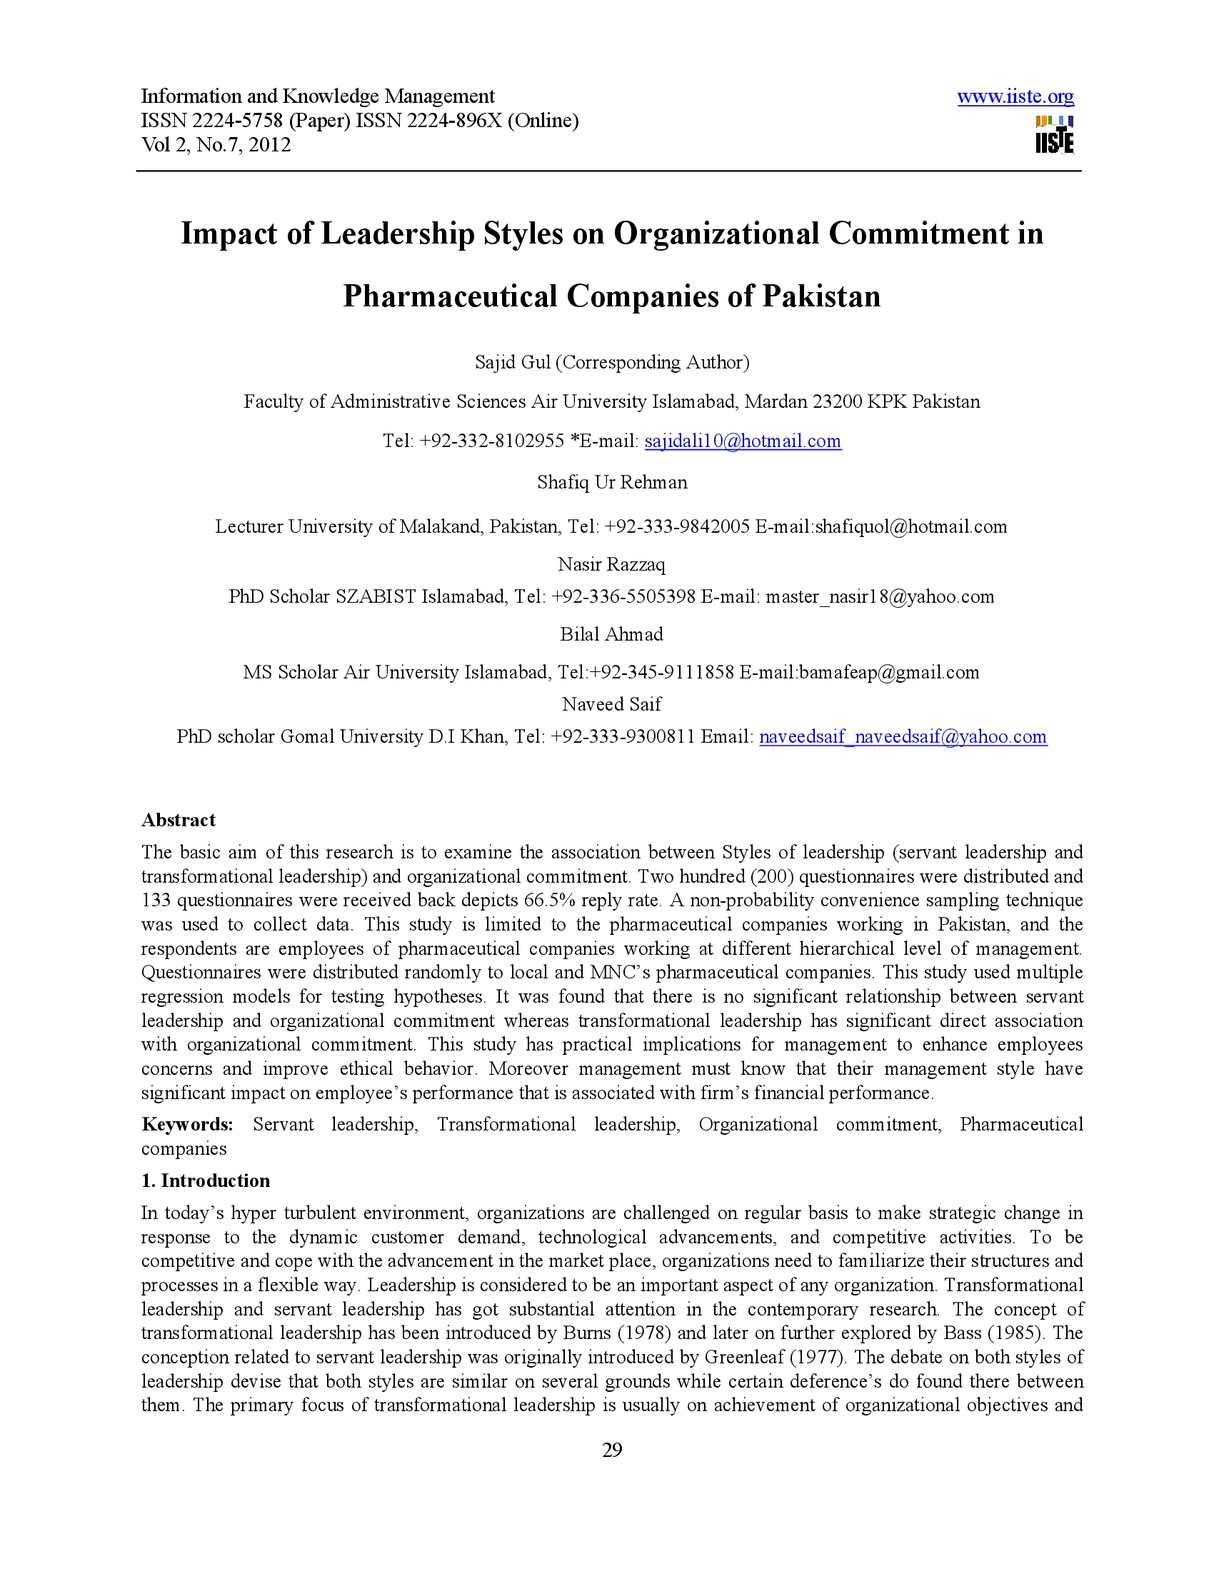 Calaméo - Impact of Leadership Styles on Organizational